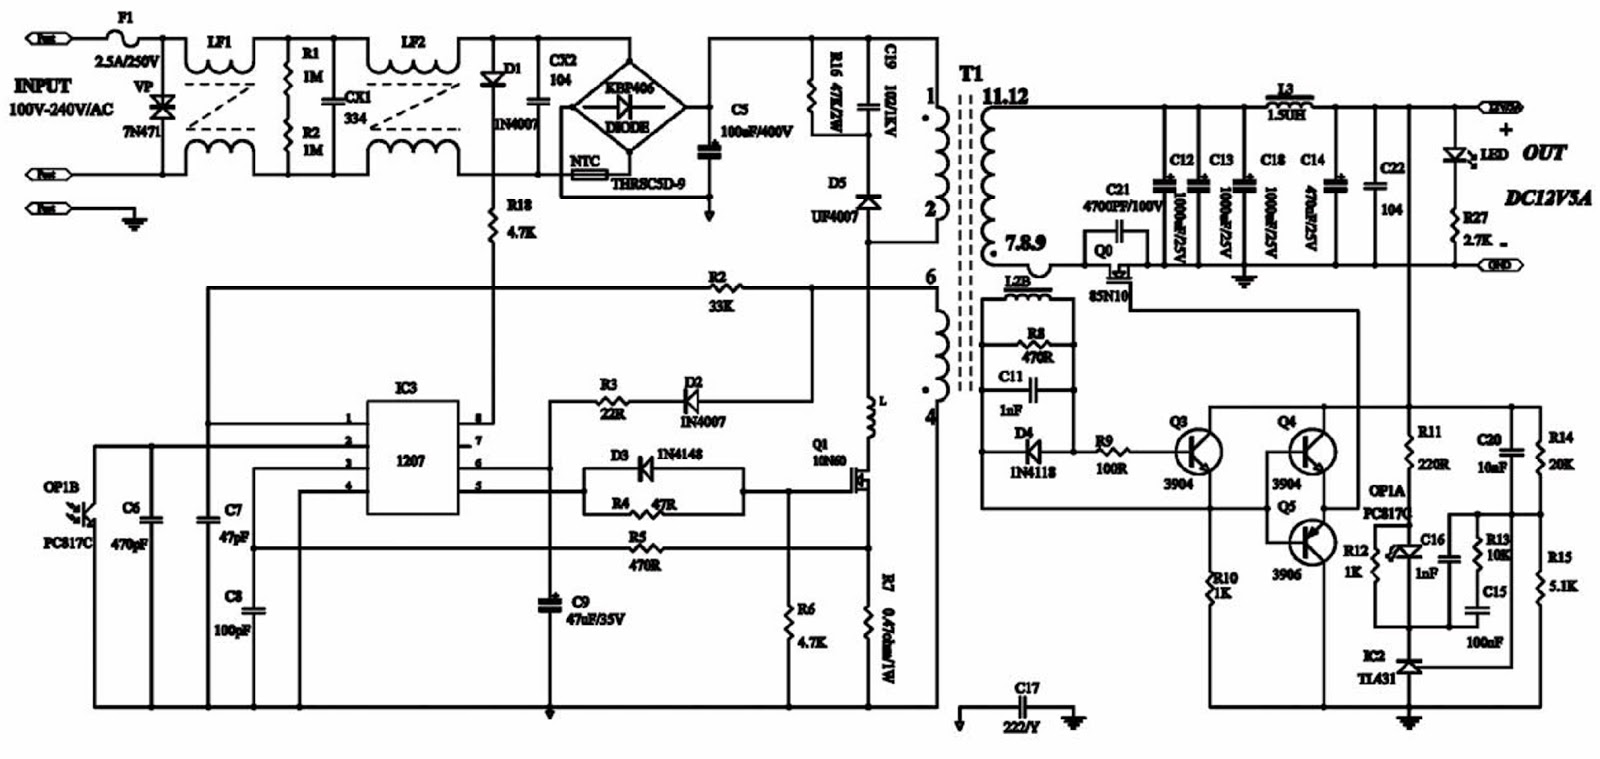 tv schematic circuit diagram wiring diagram load samsung lcd tv schematic diagram [ 1600 x 759 Pixel ]